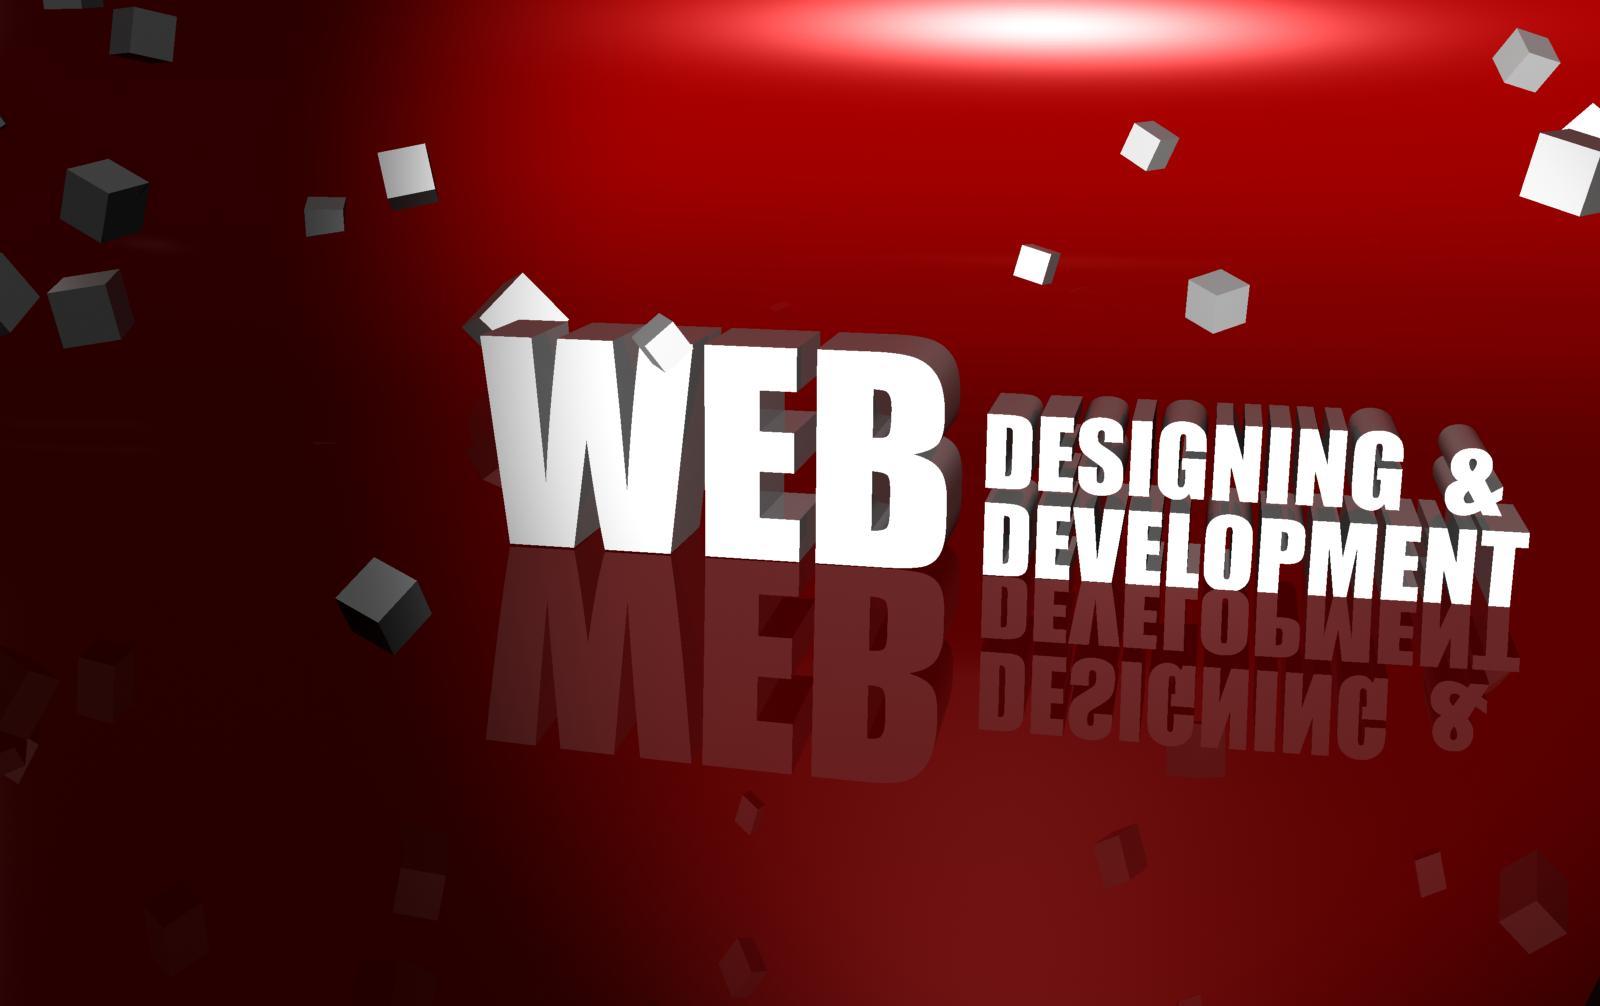 web_design_development-1-copy